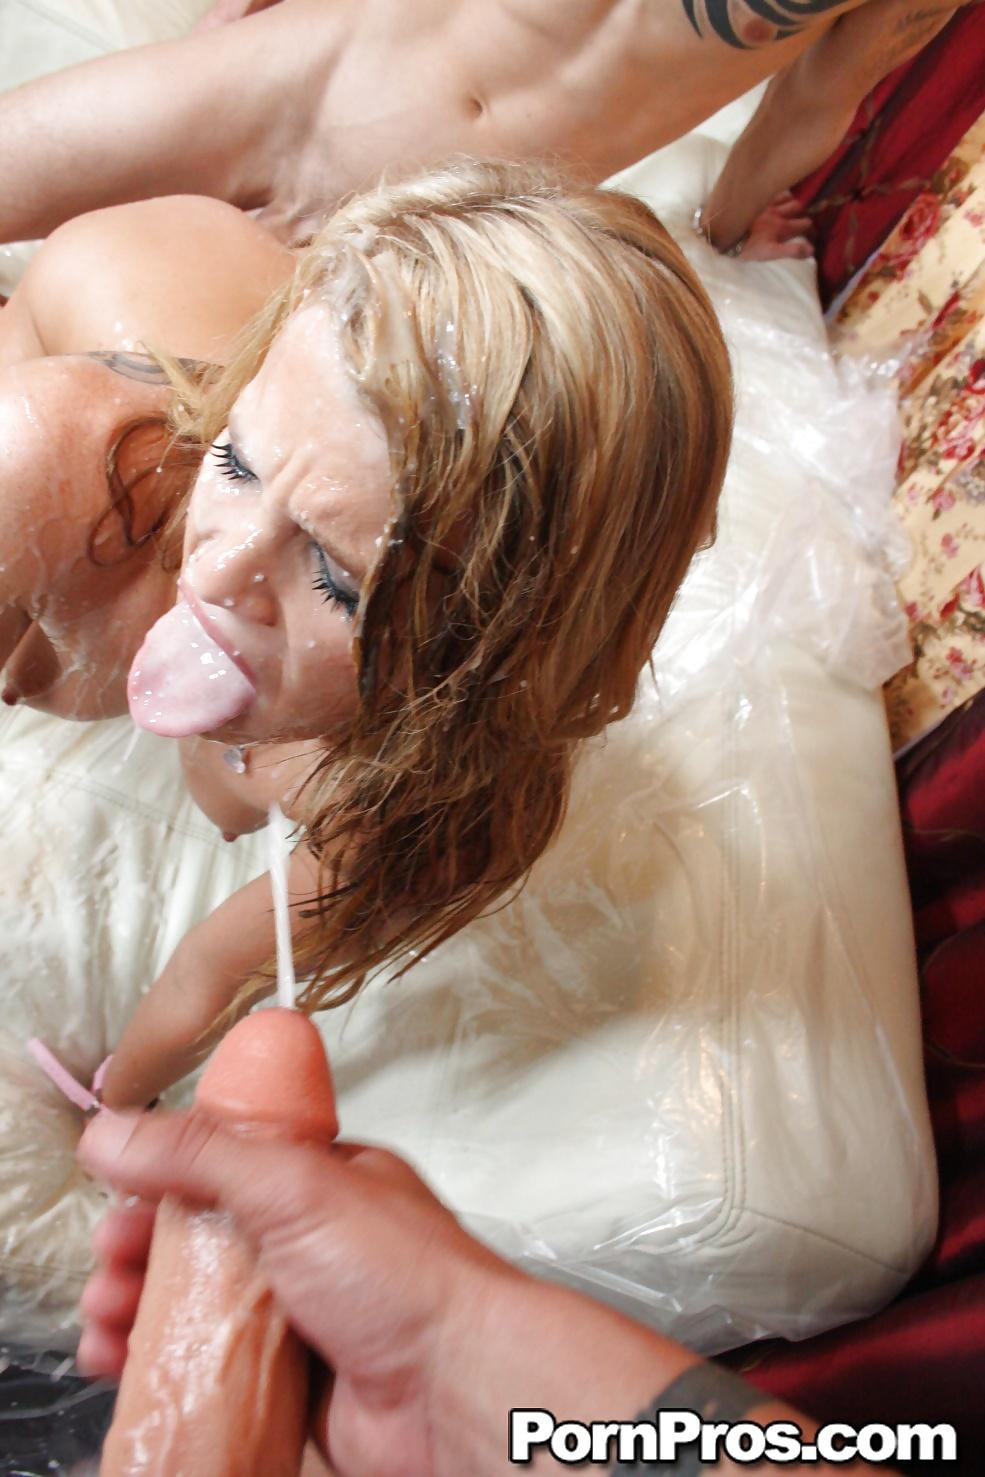 eyden-aspen-glotaet-spermu-foto-masturbiruet-anus-paltsem